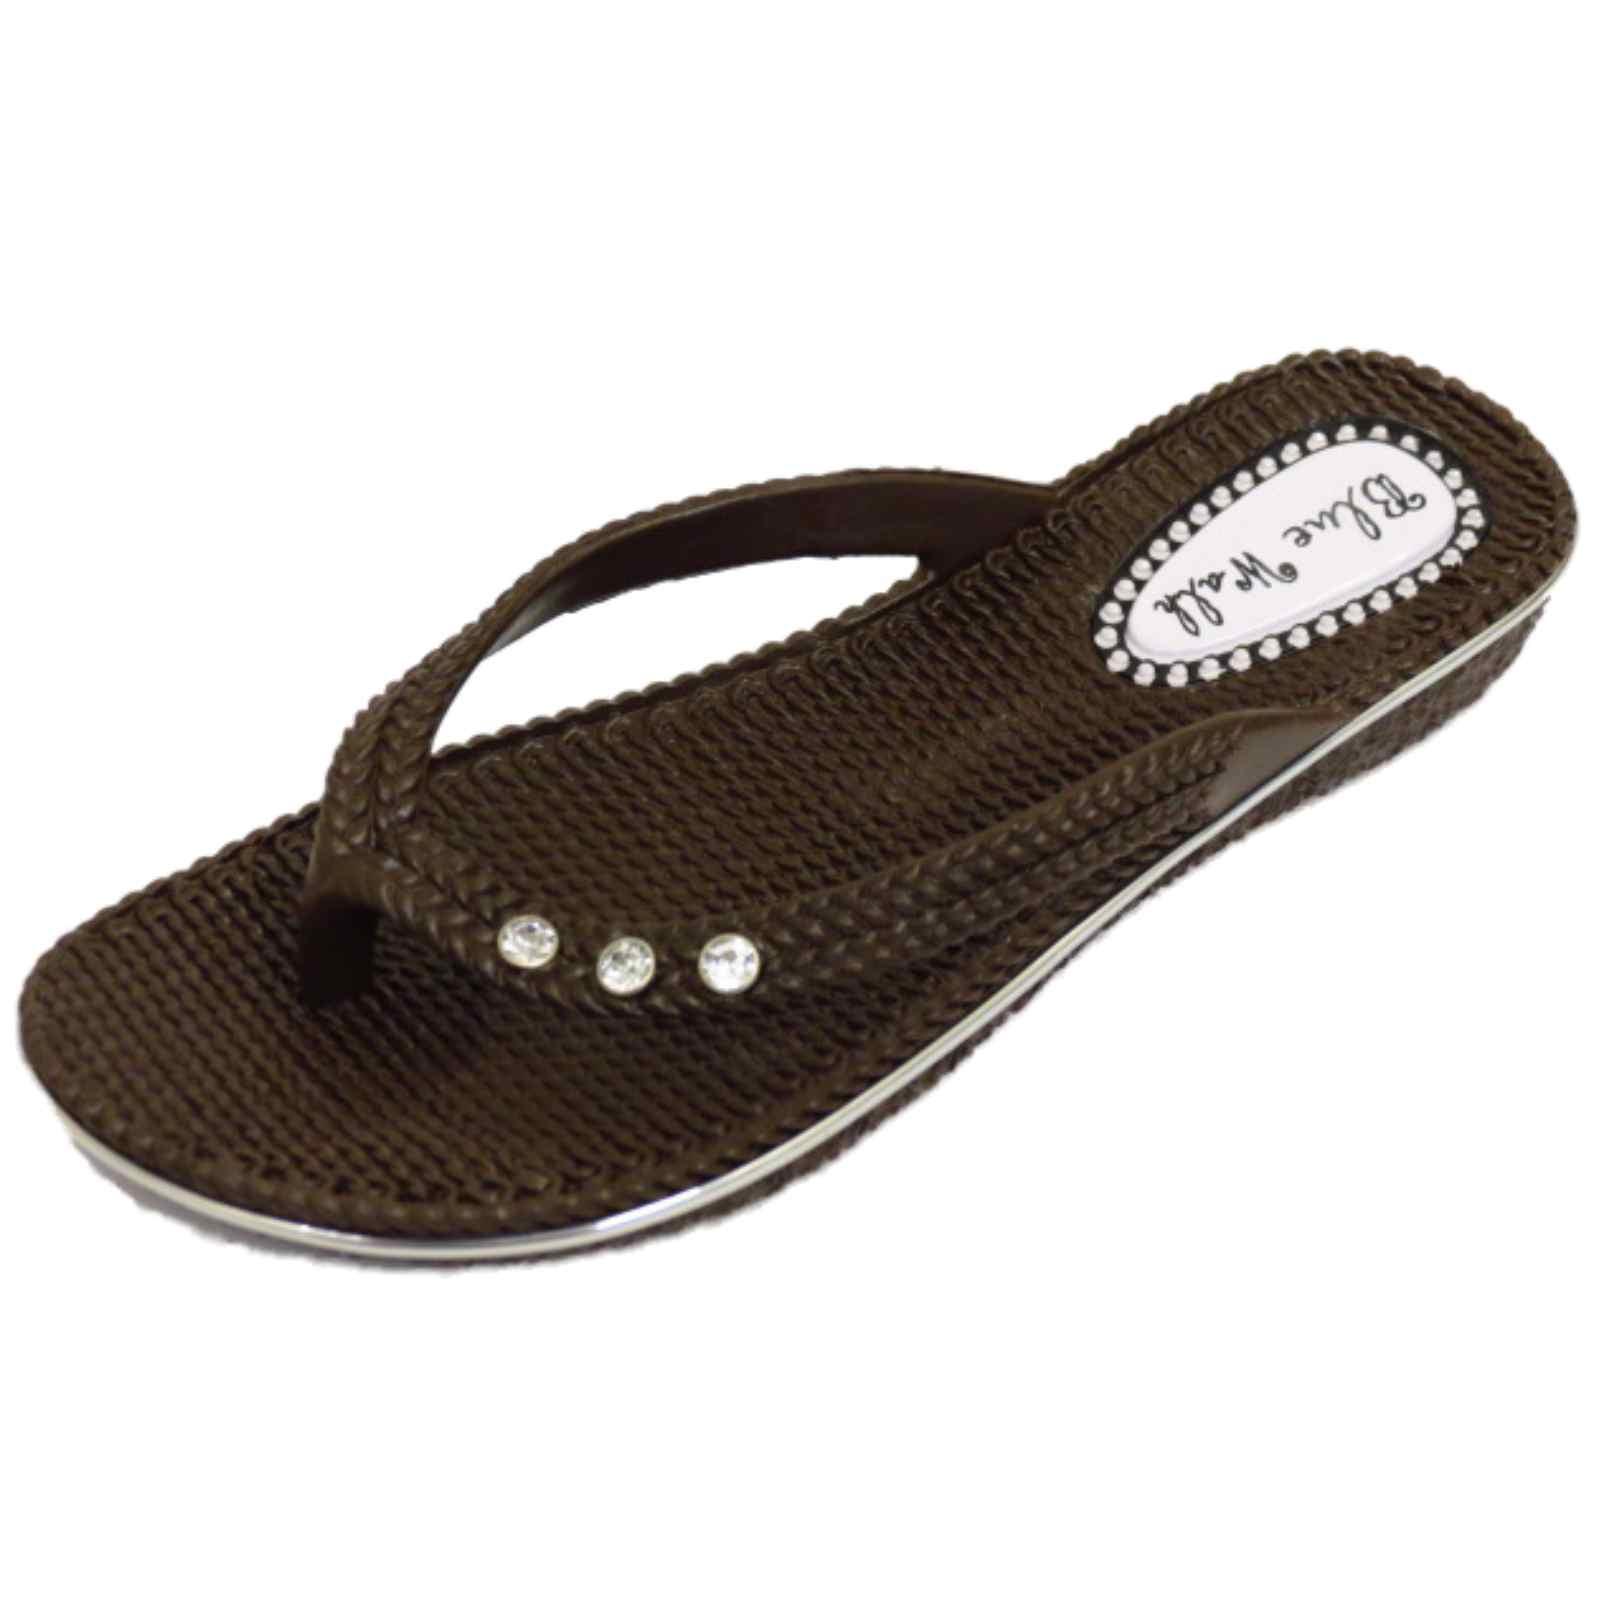 damen flach braun zehensteg sandalen flip flop strand holiday tanga sommer ebay. Black Bedroom Furniture Sets. Home Design Ideas